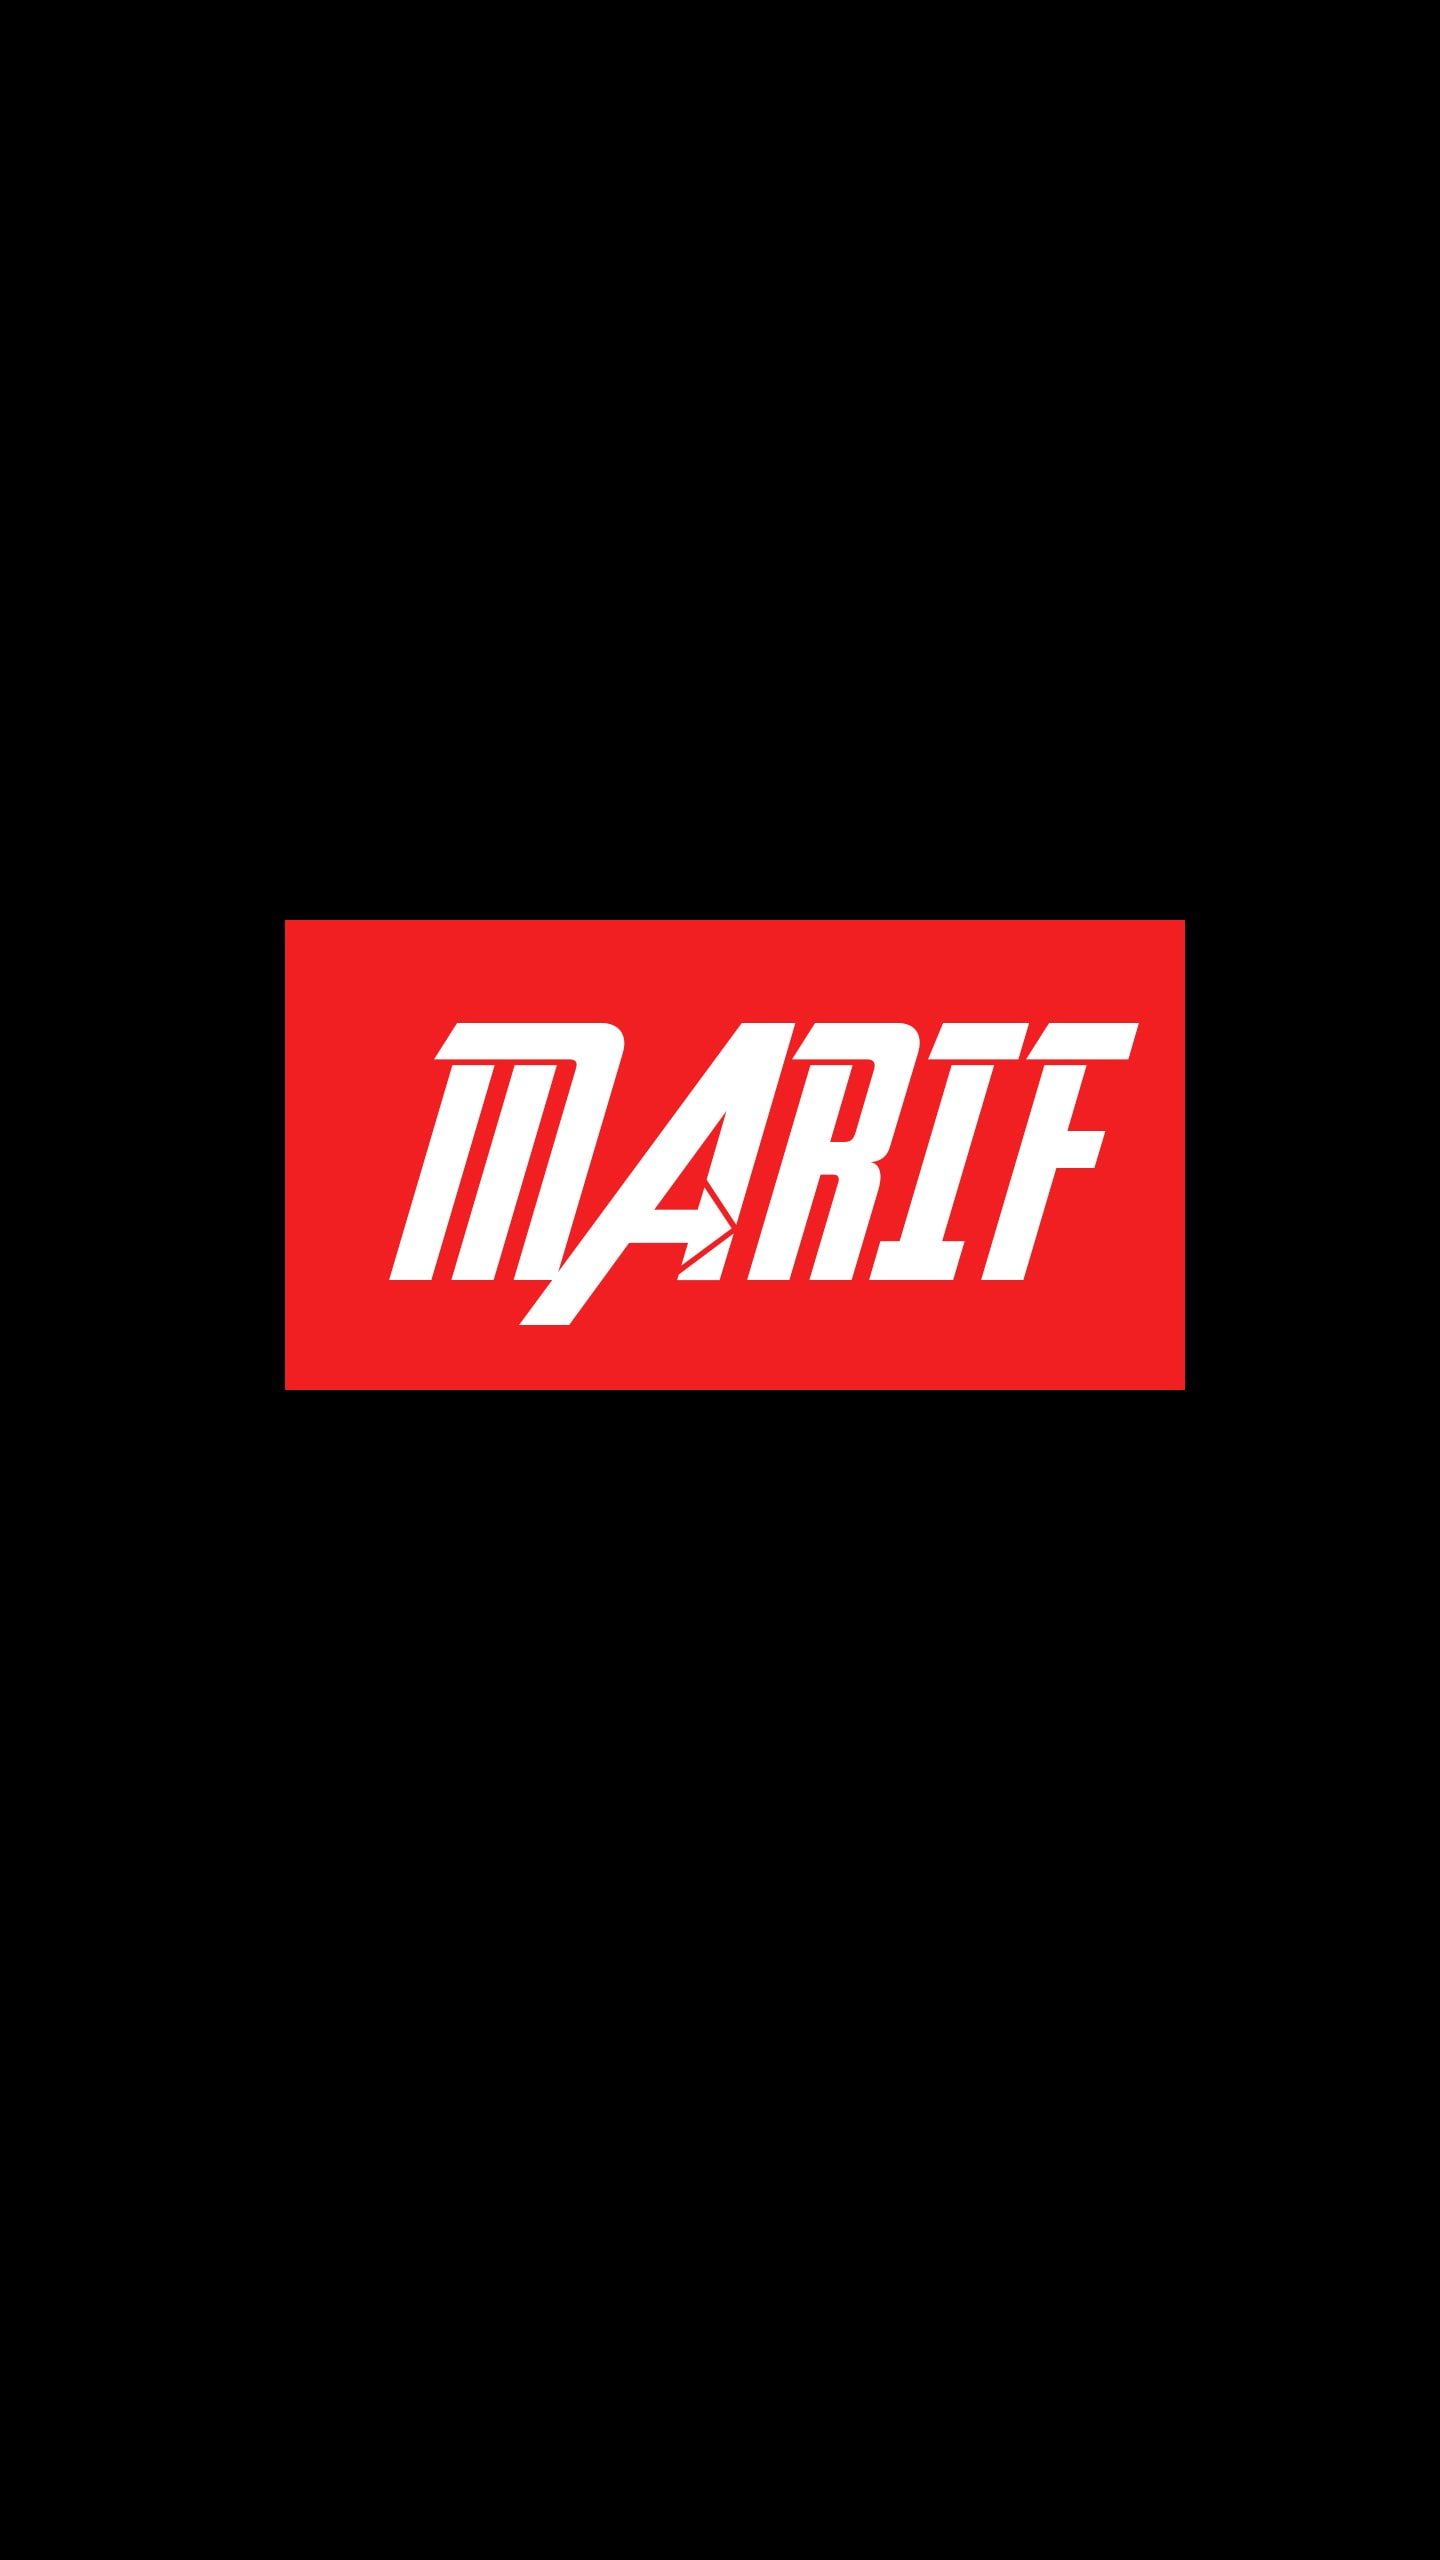 Go to marif shaik's profile